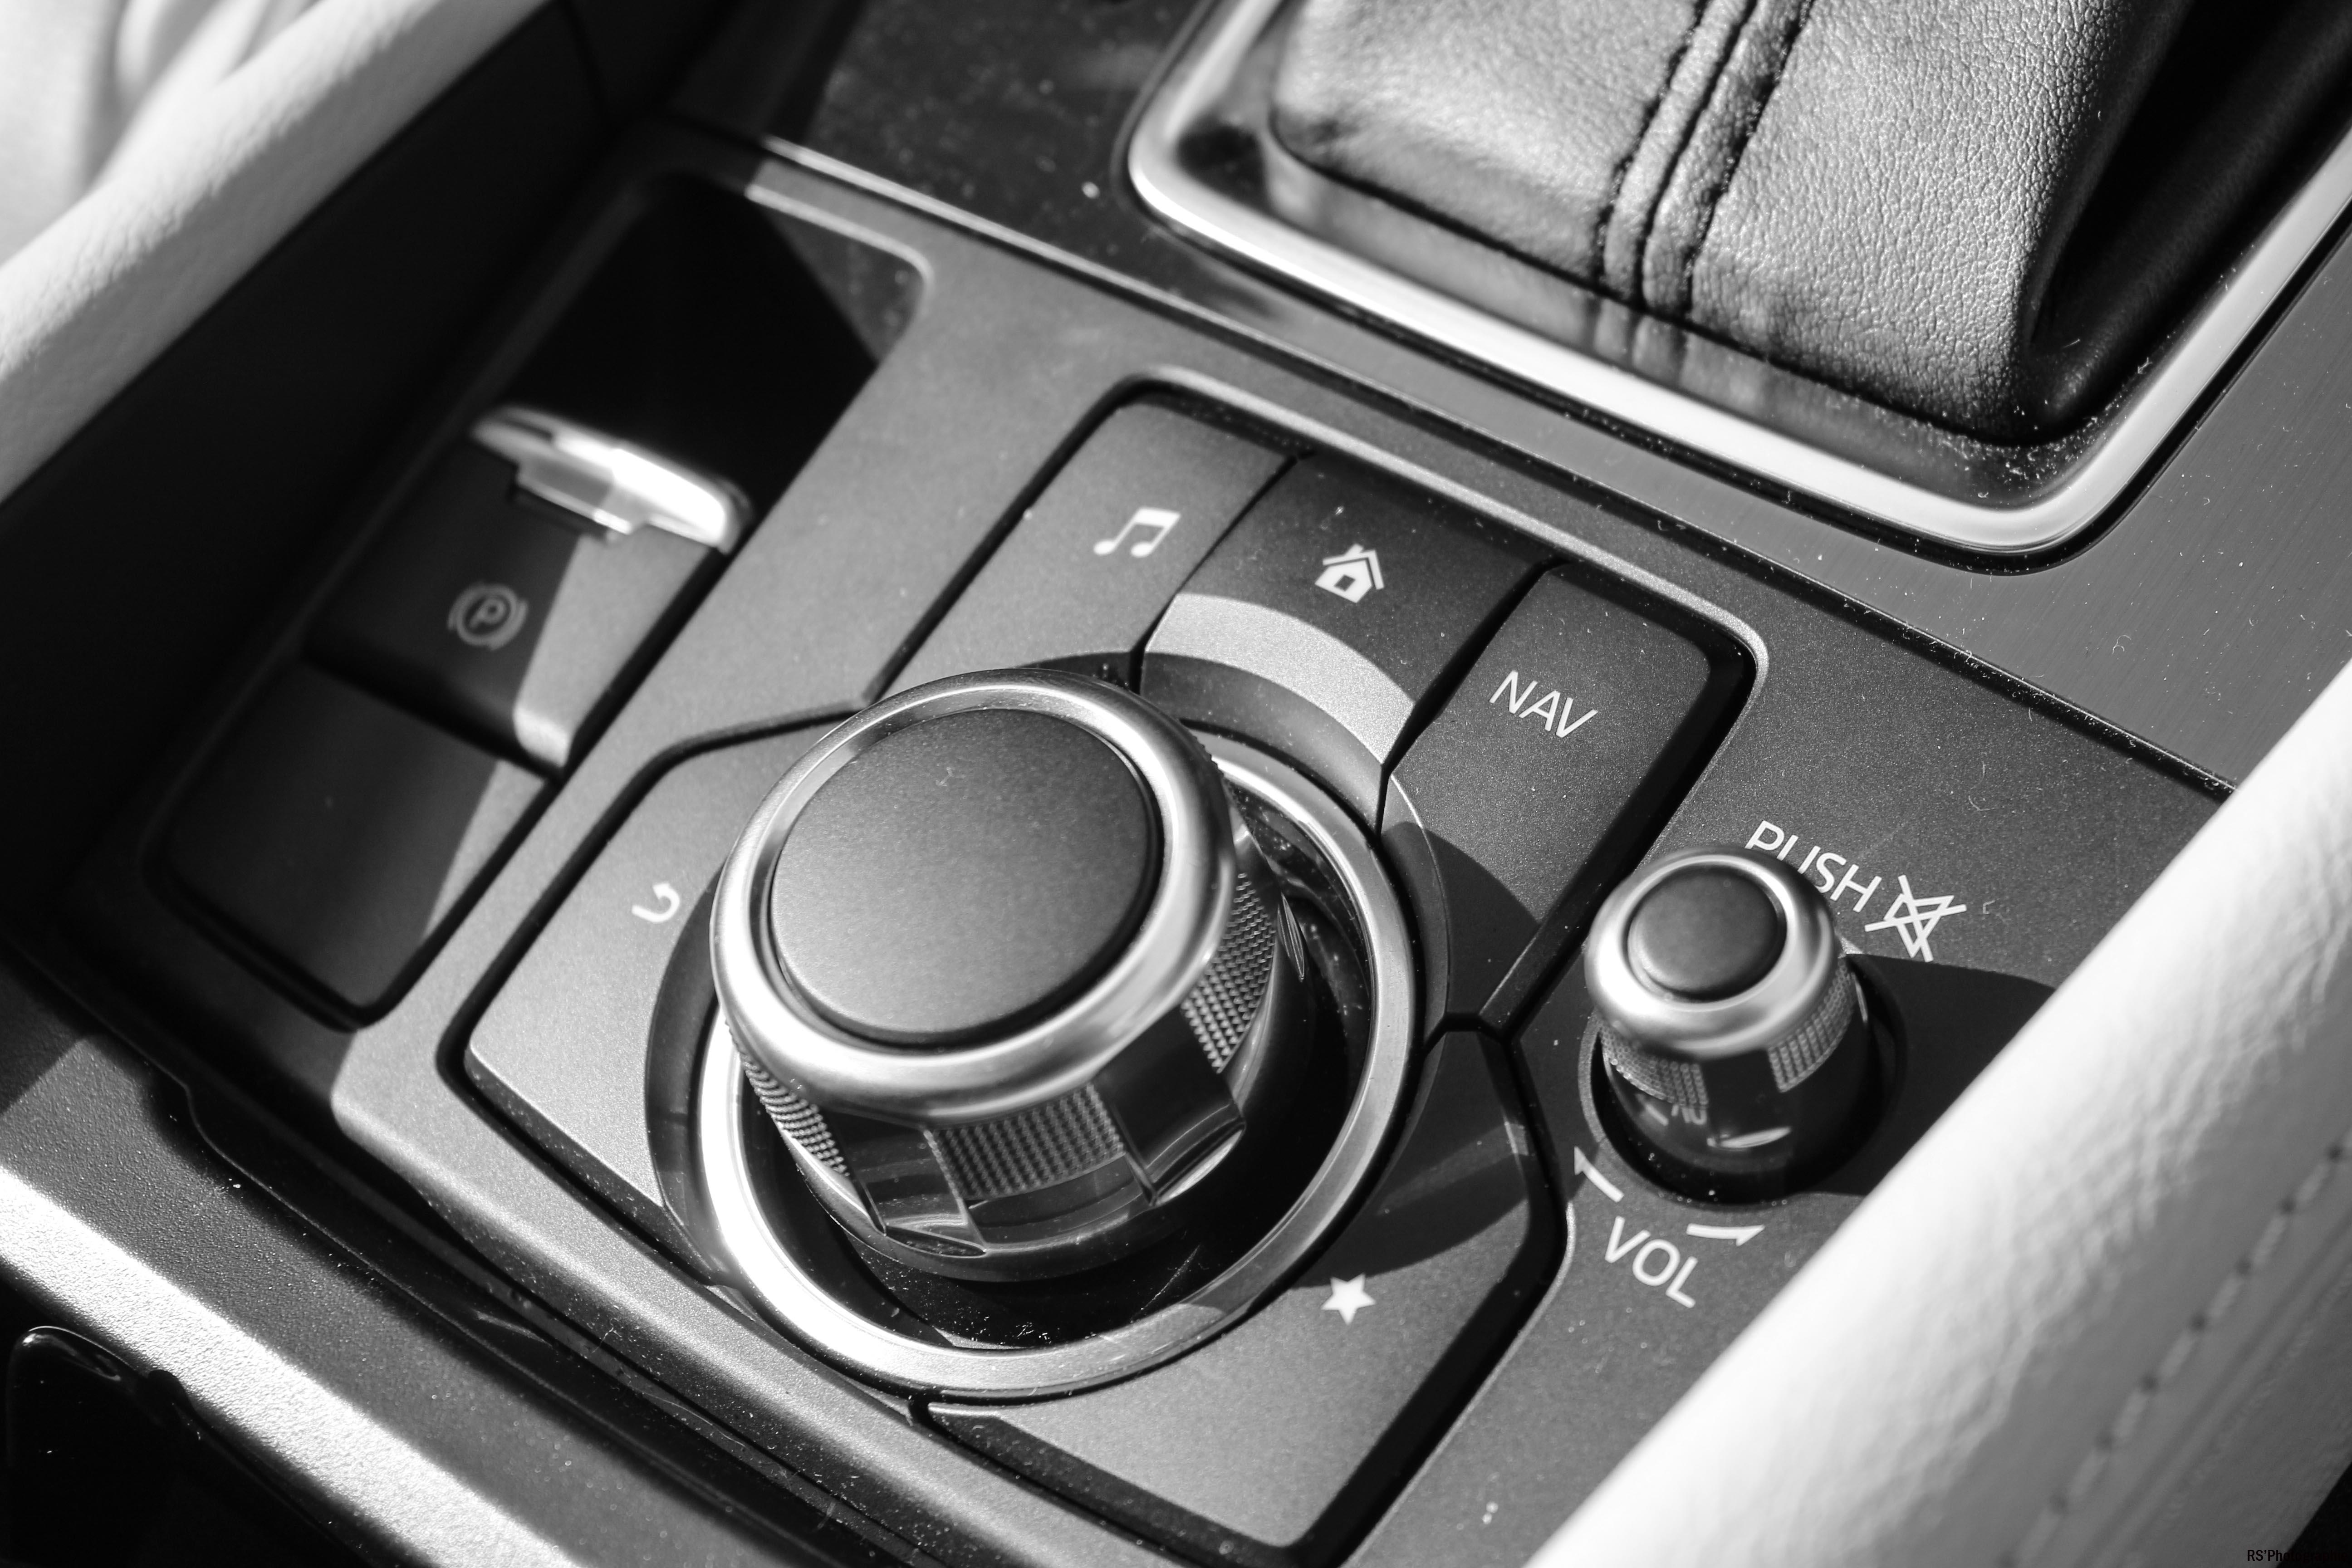 Mazda6SW37-mazda-6-sw-intérieur-onboard-arnaud-demasier-rsphotographie